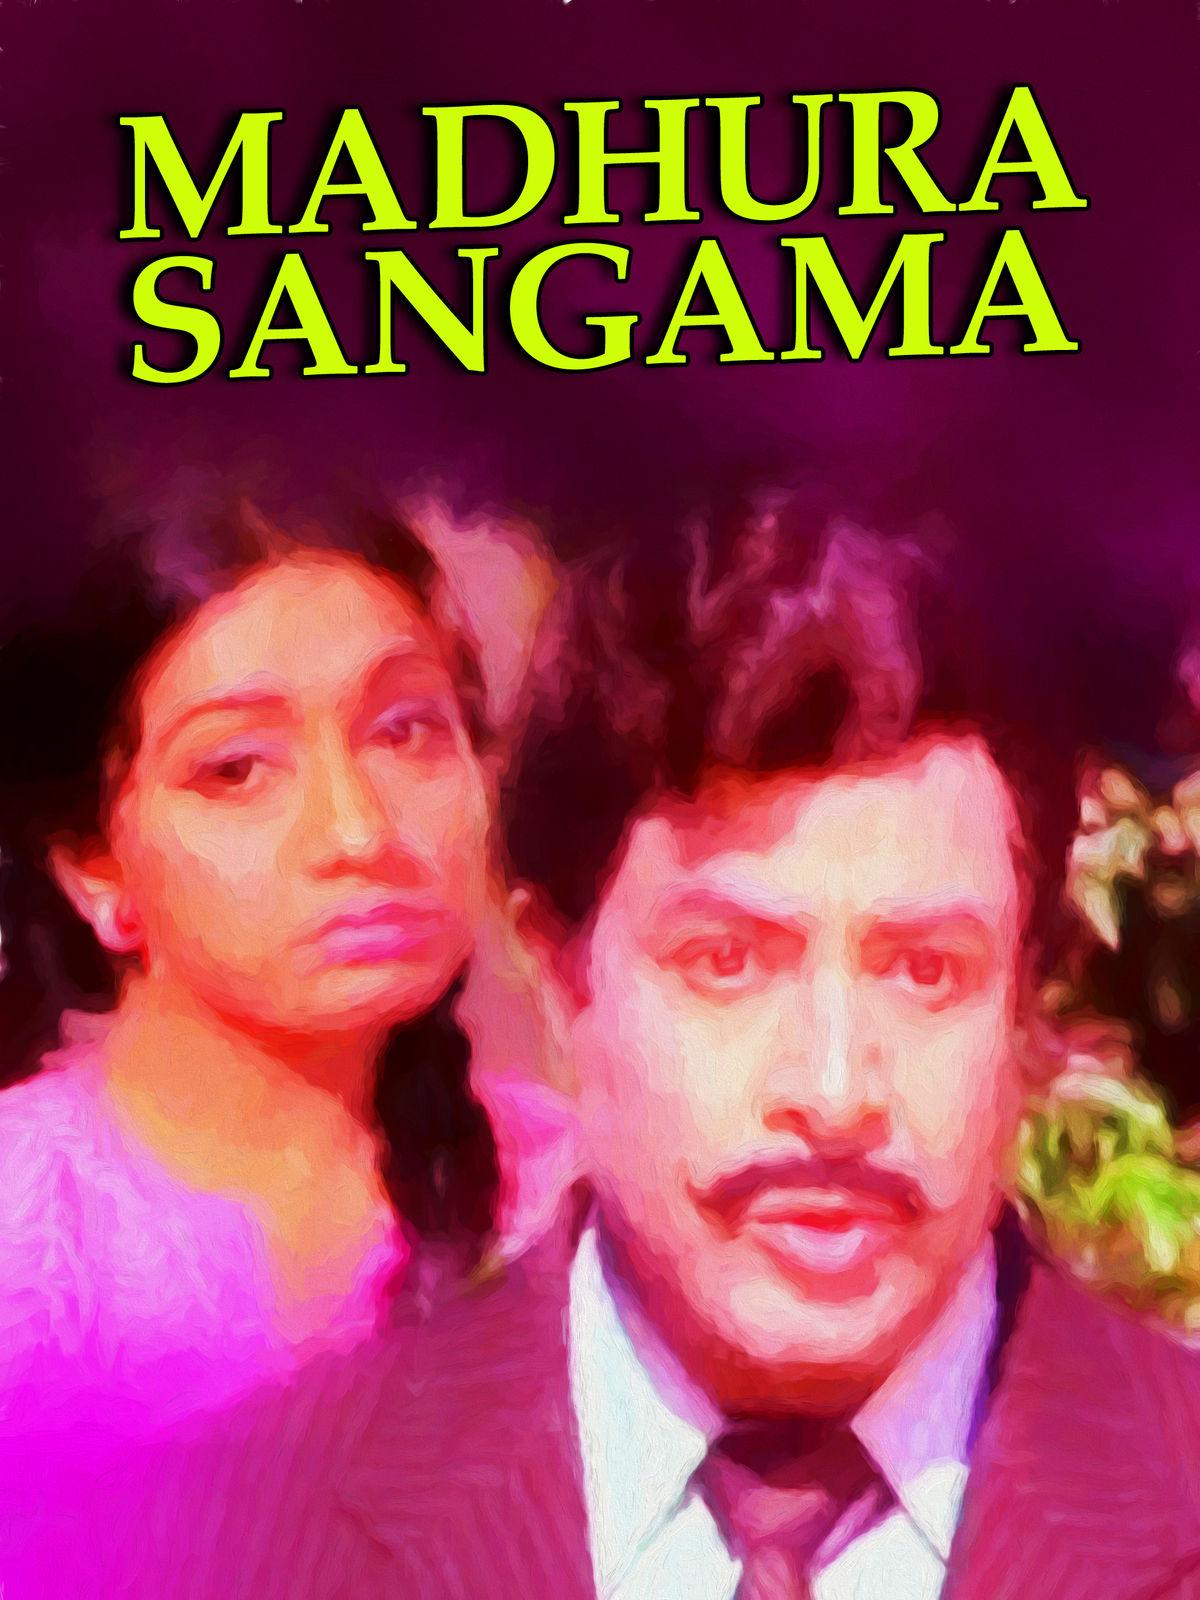 Madhura Sangama